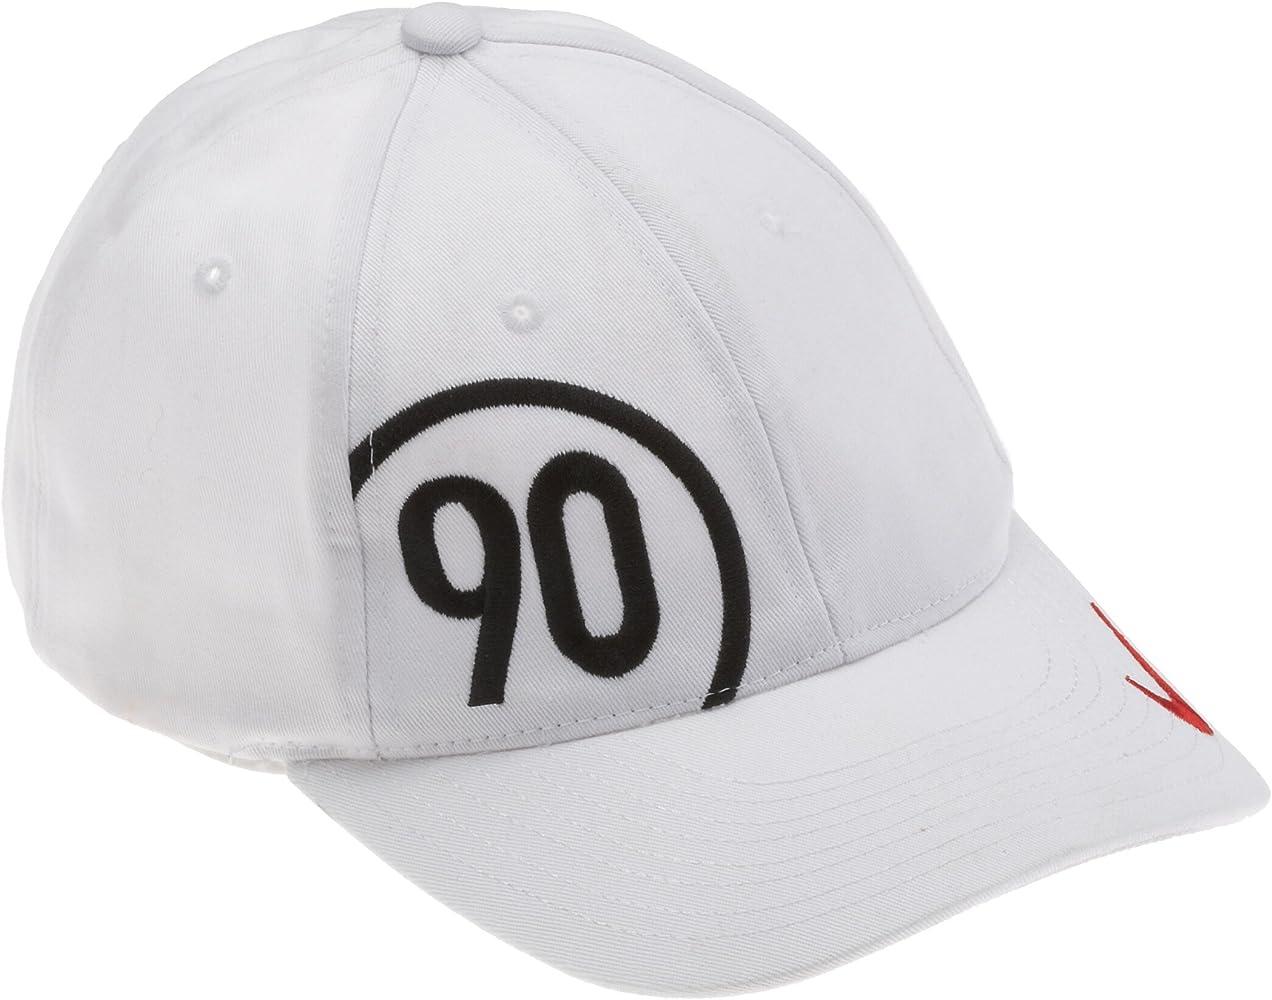 Nike Total 90 – Gorra Talla única, Blanco: Amazon.es: Ropa y ...